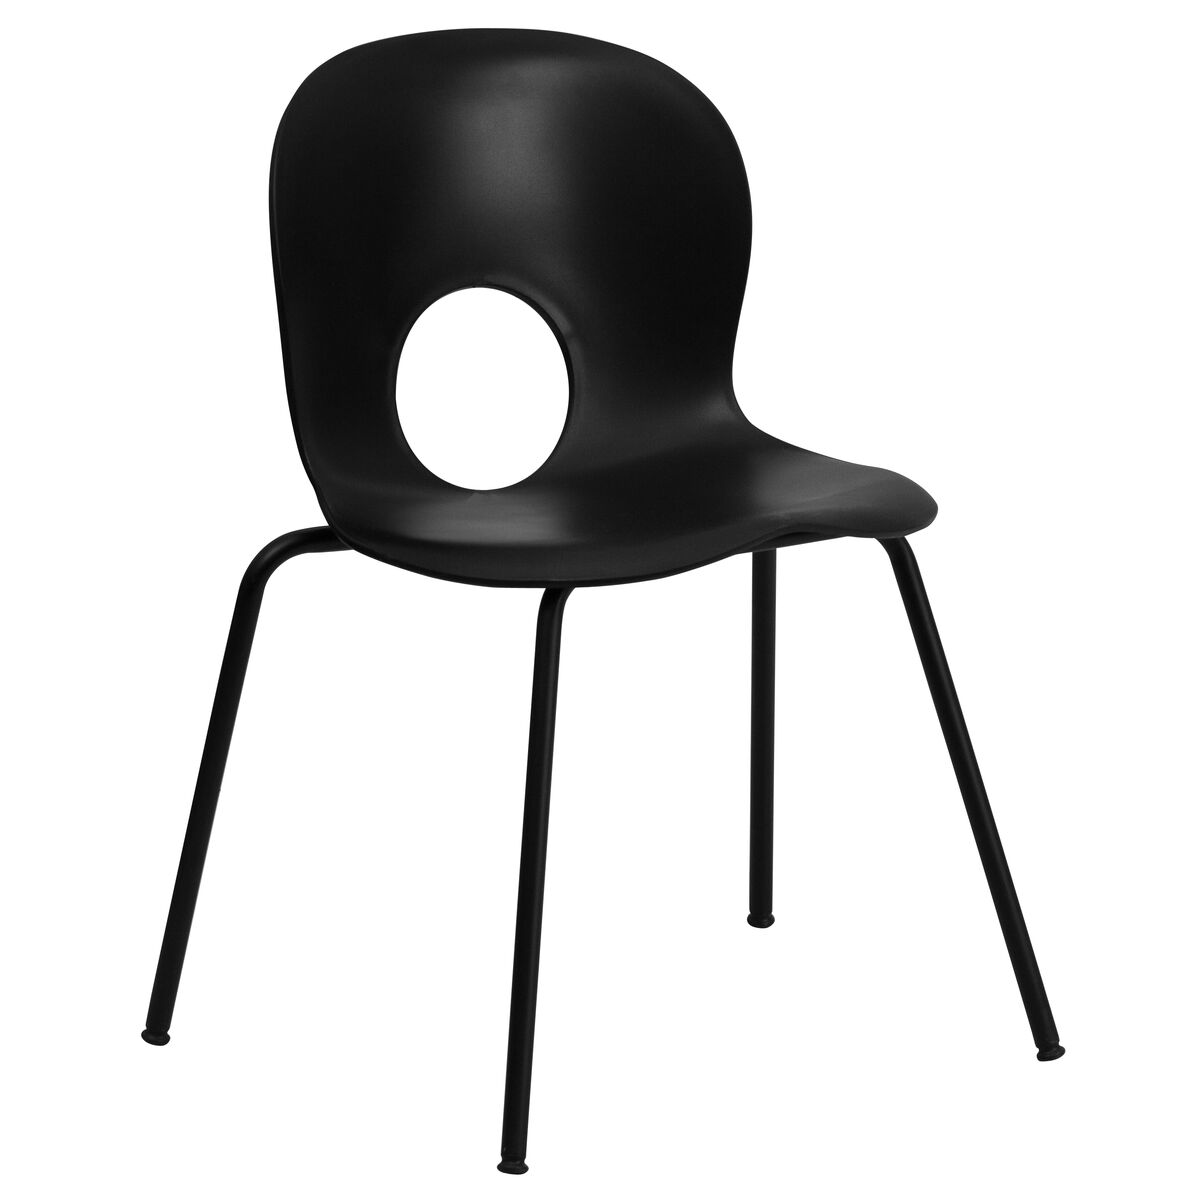 black plastic stack chair rut nc258 bk gg. Black Bedroom Furniture Sets. Home Design Ideas